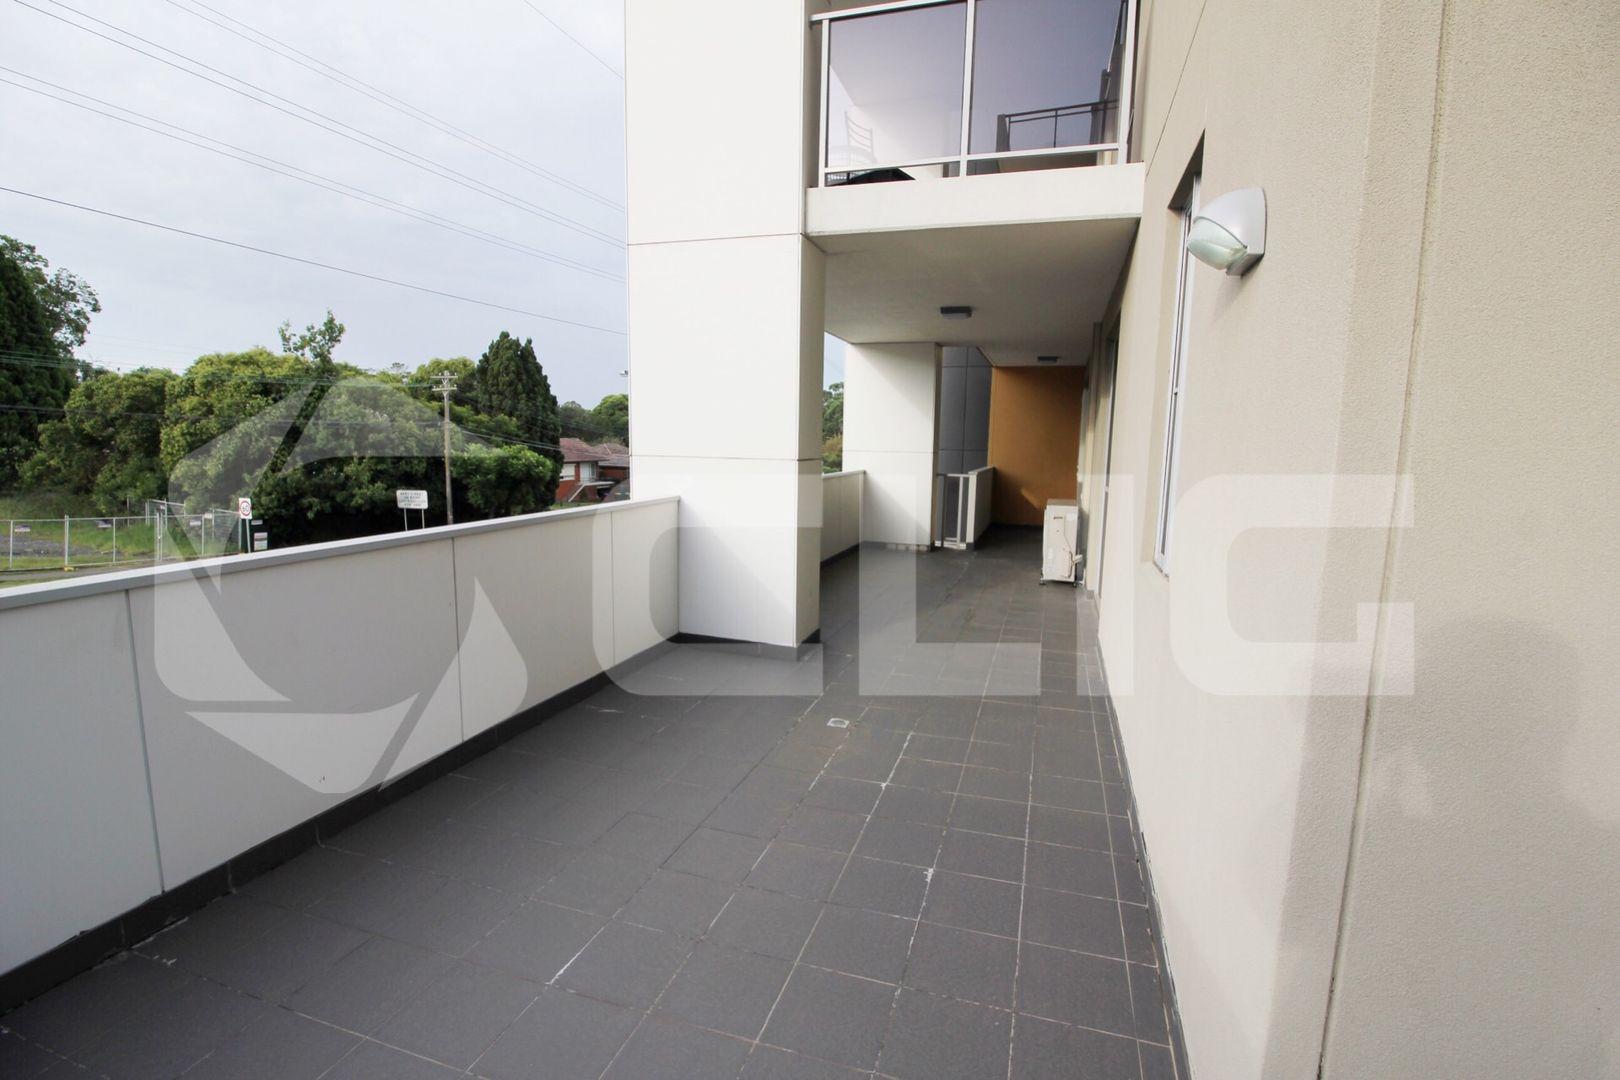 14/231-233  Carlingford Road, Carlingford NSW 2118, Image 2